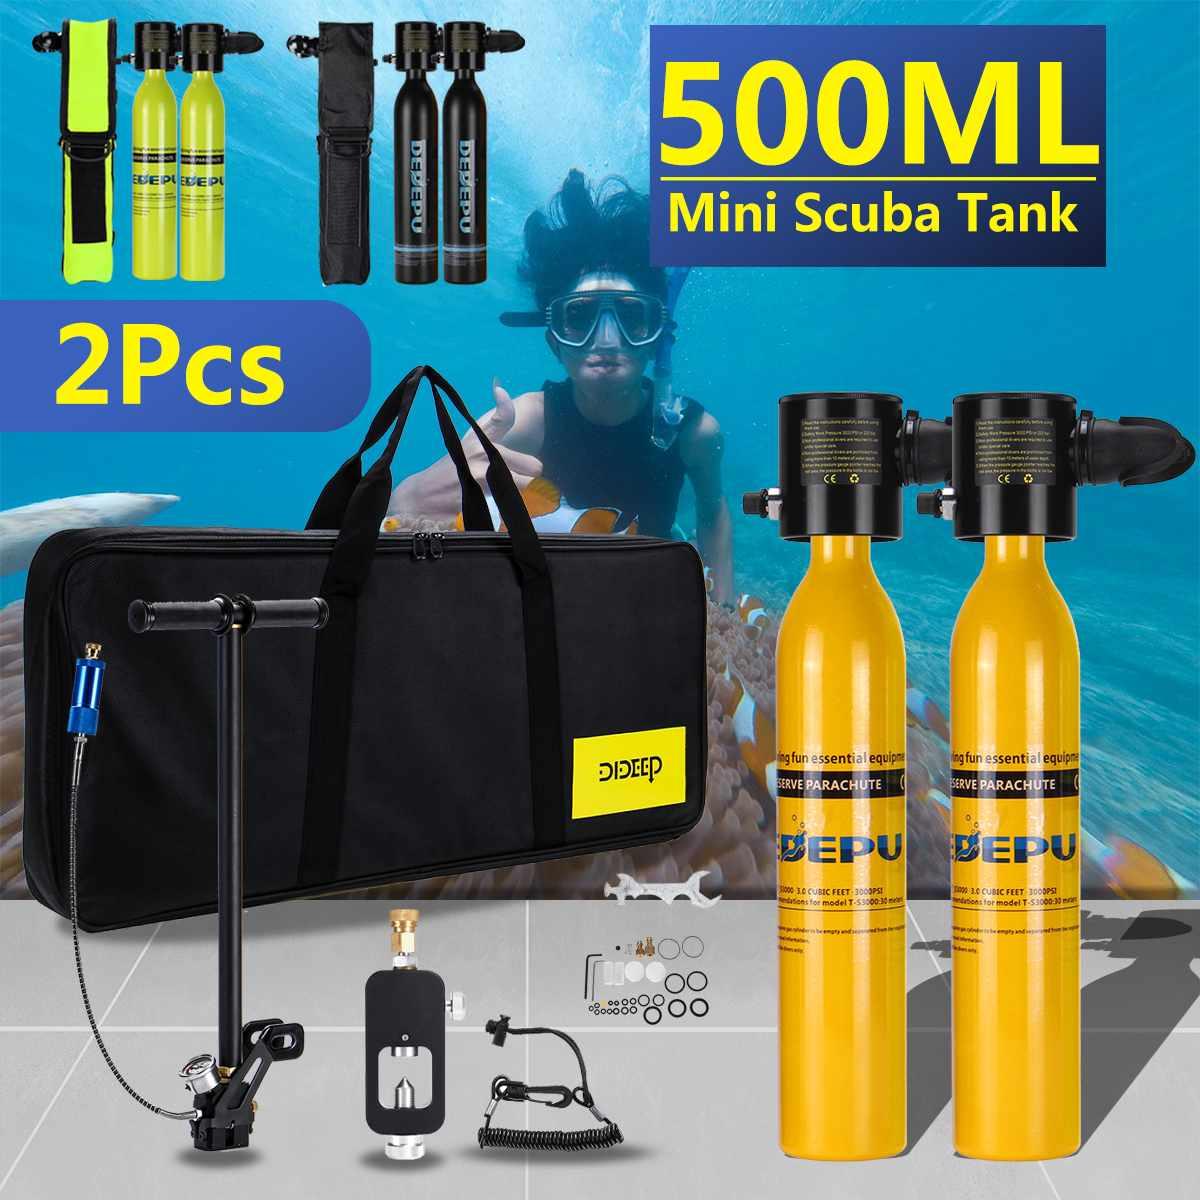 500ml Diving System Mini Scuba Cylinder Scuba Oxygen Reserve A.ir Tank Pump Aluminum Box Snorkeling Diving Equipment Set